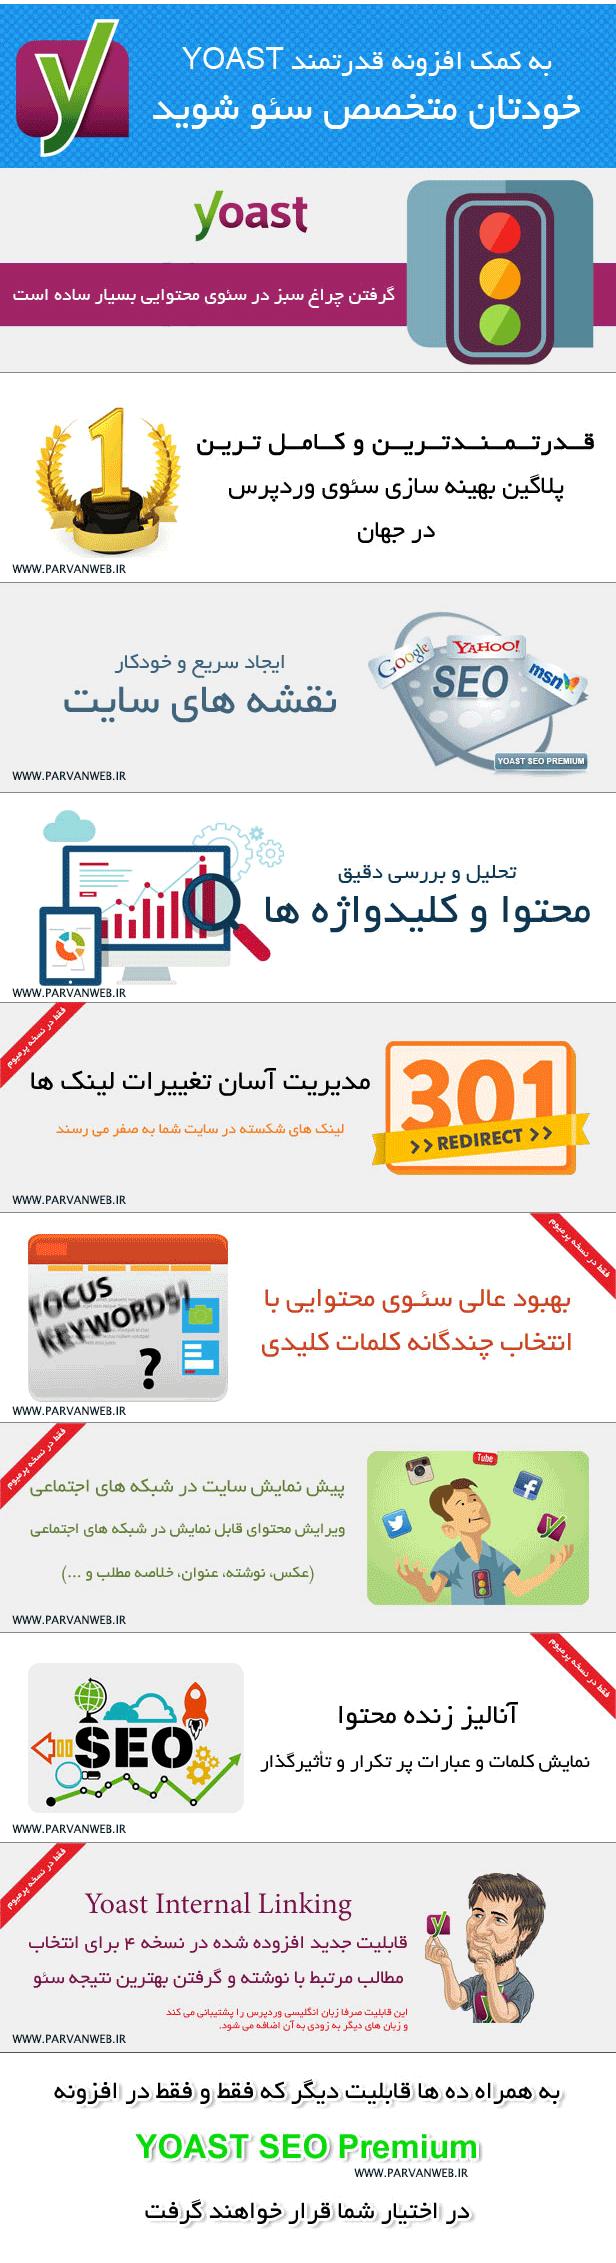 banner wordpress seo yoast - افزونه سئو وردپرس نسخه حرفه ای Yoast SEO Premium کاملا فارسی